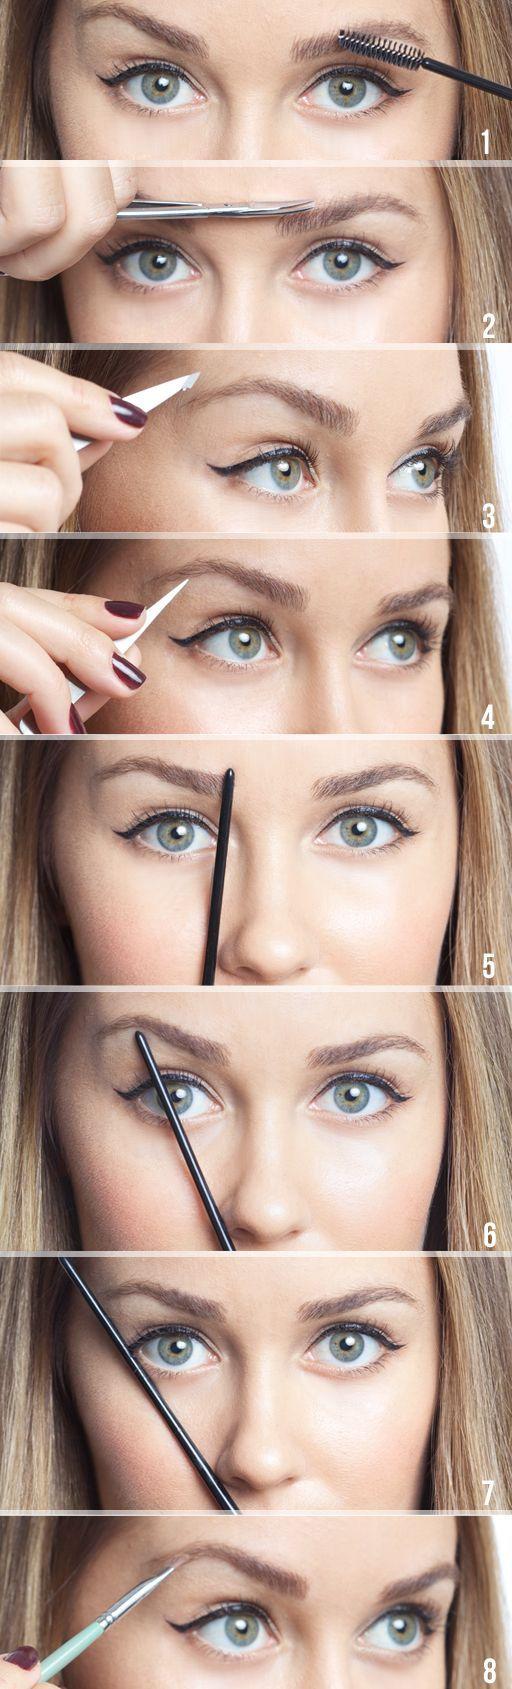 Eyebrow Tweeze! | thebeautyspotqld.com.au                                                                                                                                                                                 More